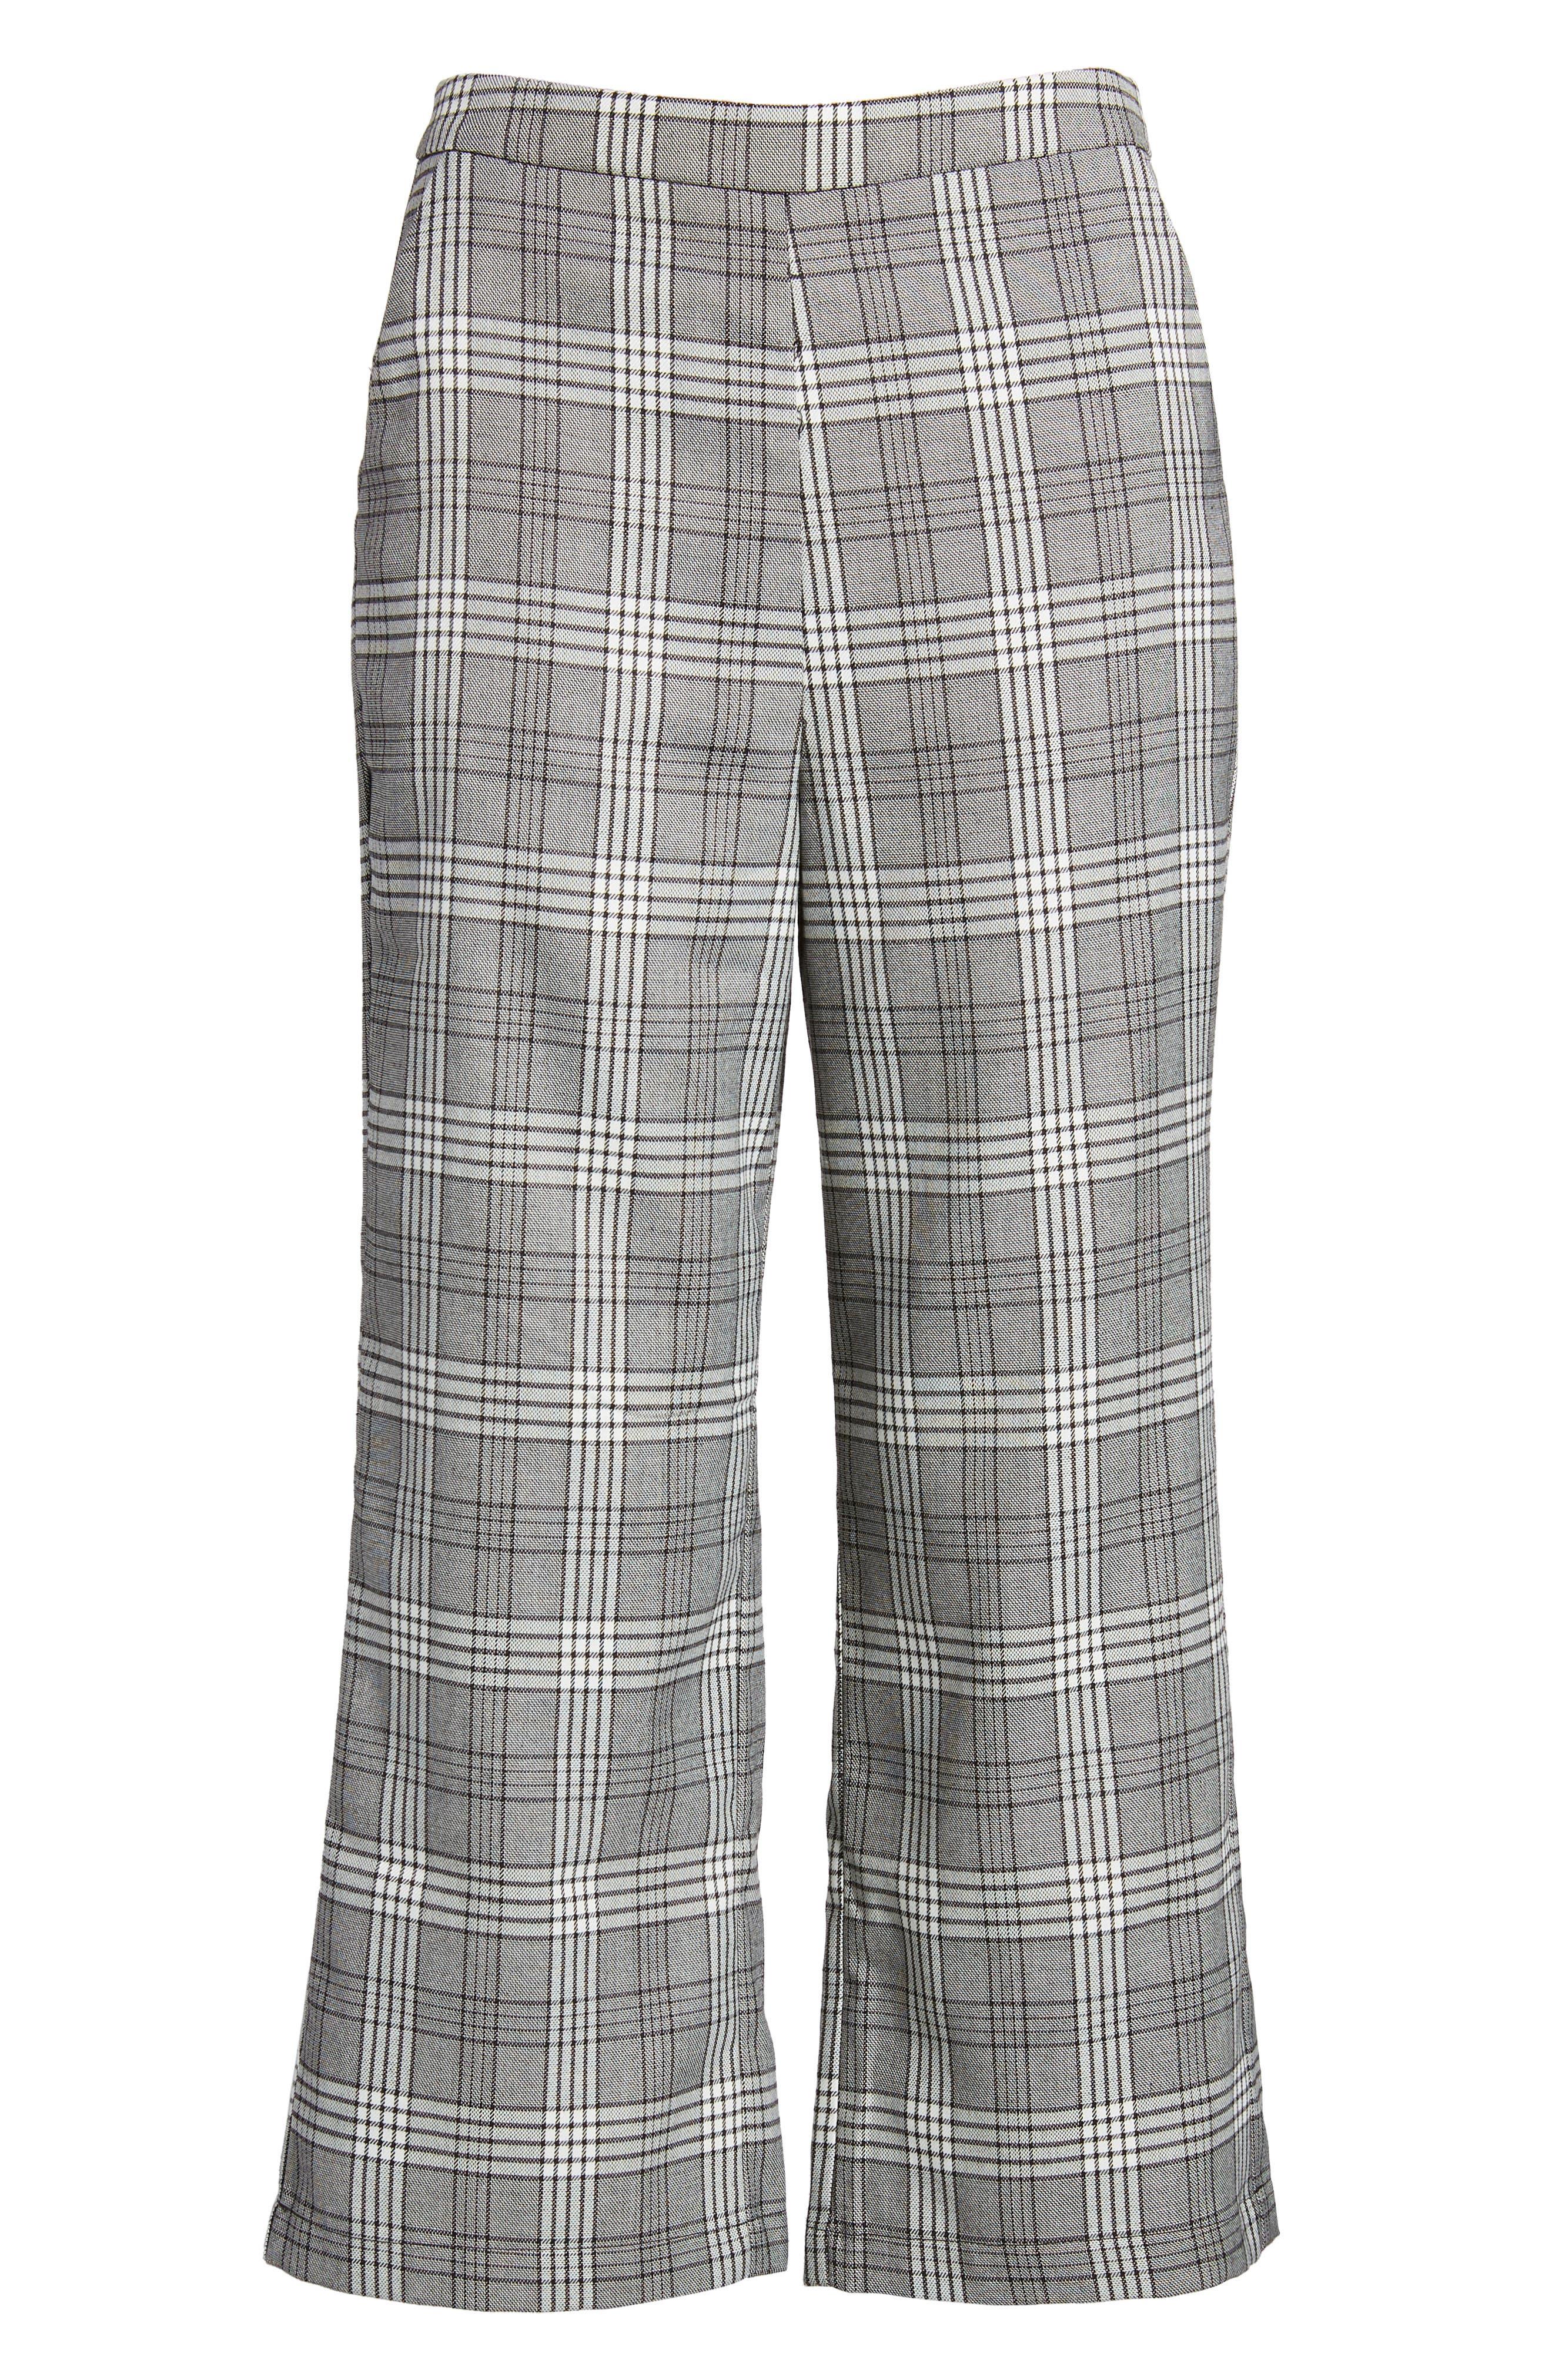 Slater Crop Pants,                             Alternate thumbnail 7, color,                             250